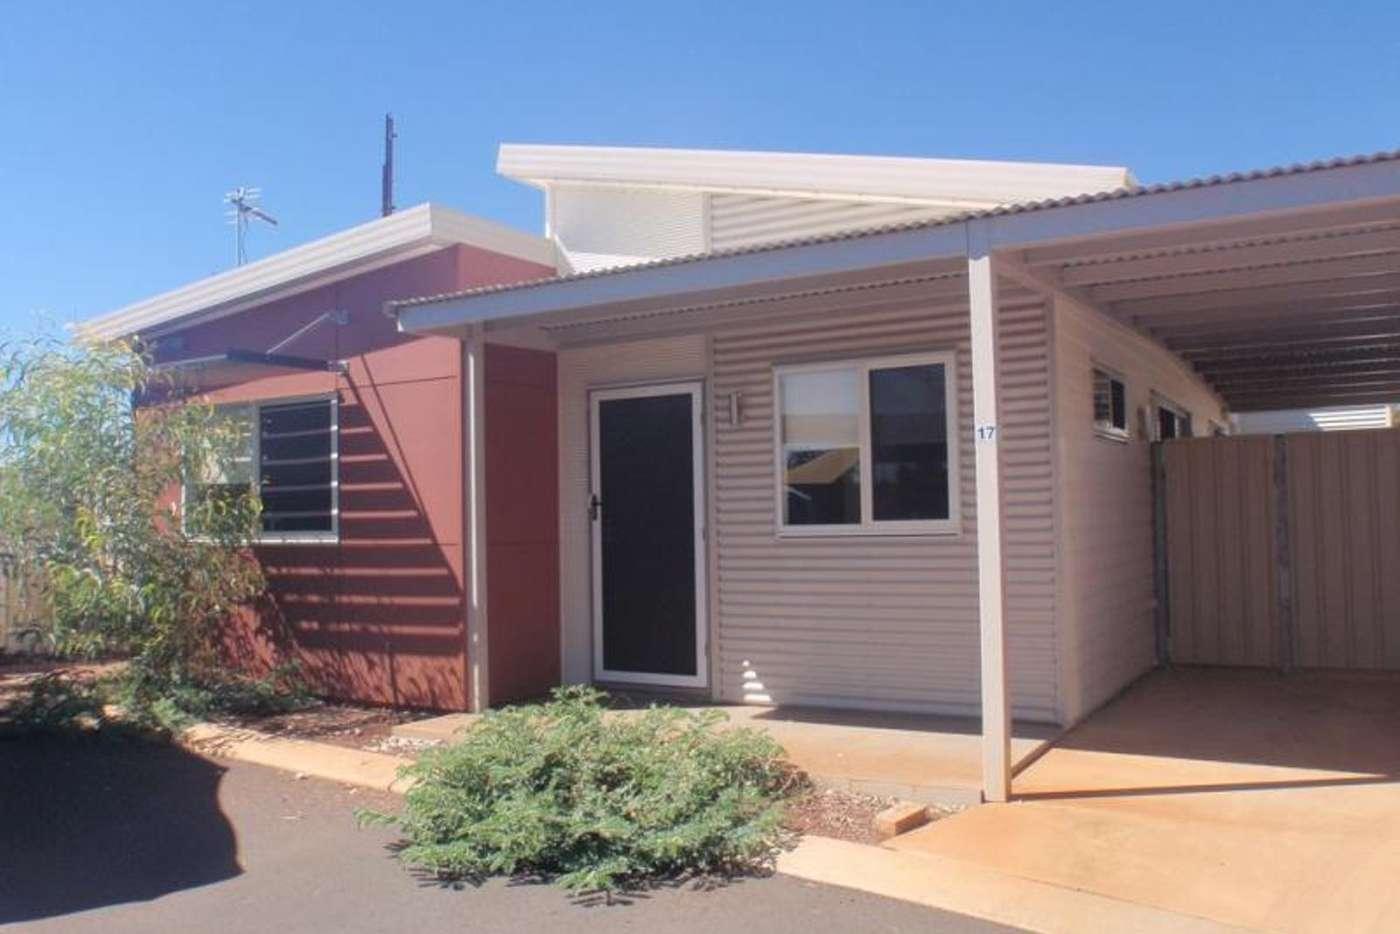 Main view of Homely house listing, 17/28 Padbury Way, Bulgarra WA 6714